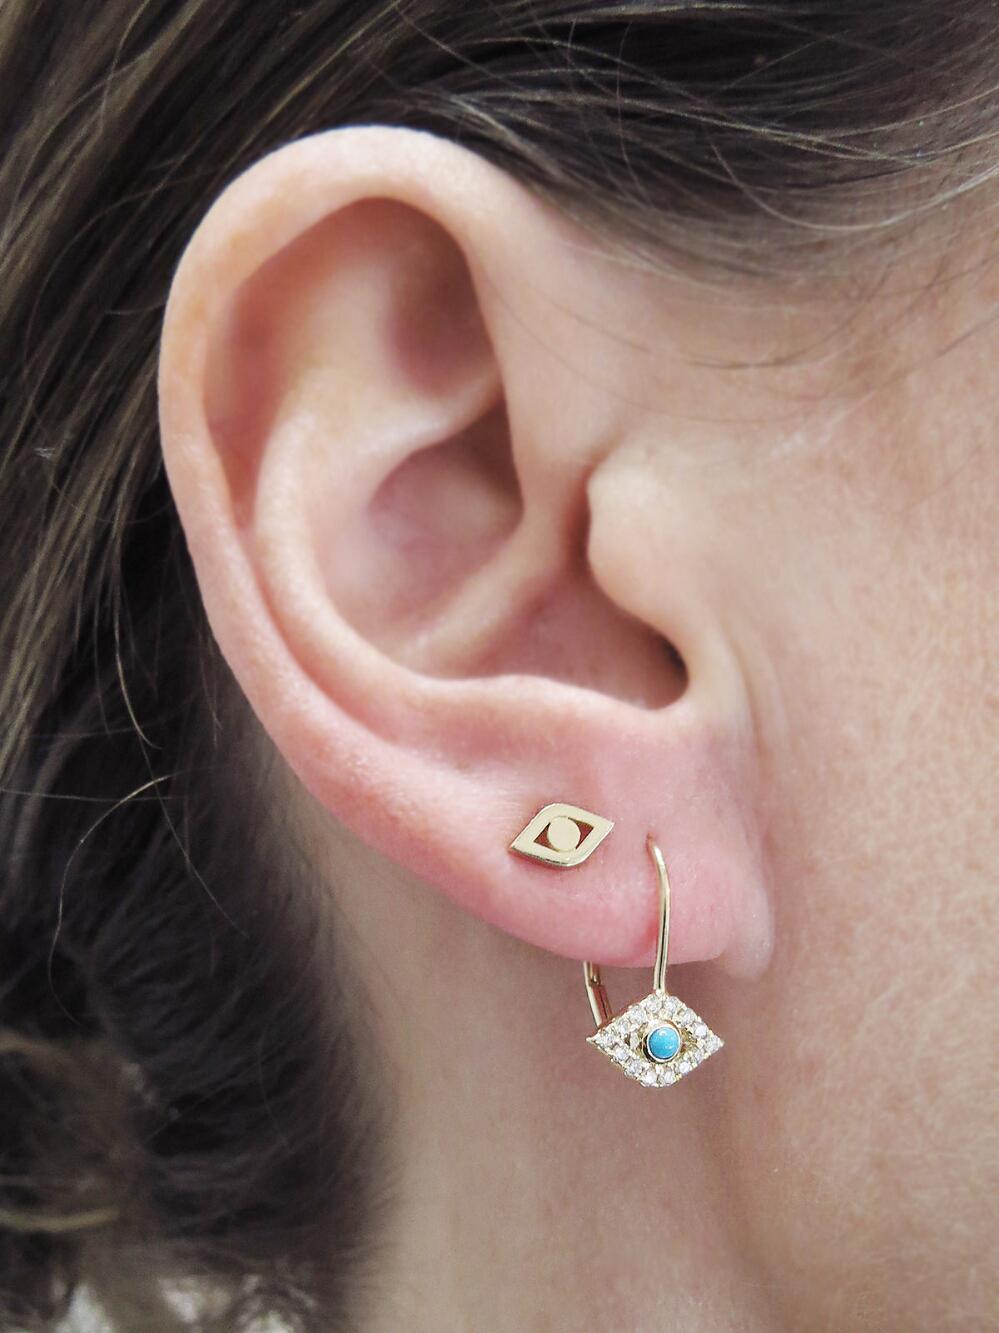 c8c12c754 Lyst - Sydney Evan Pure Evil Eye Single Stud Earring